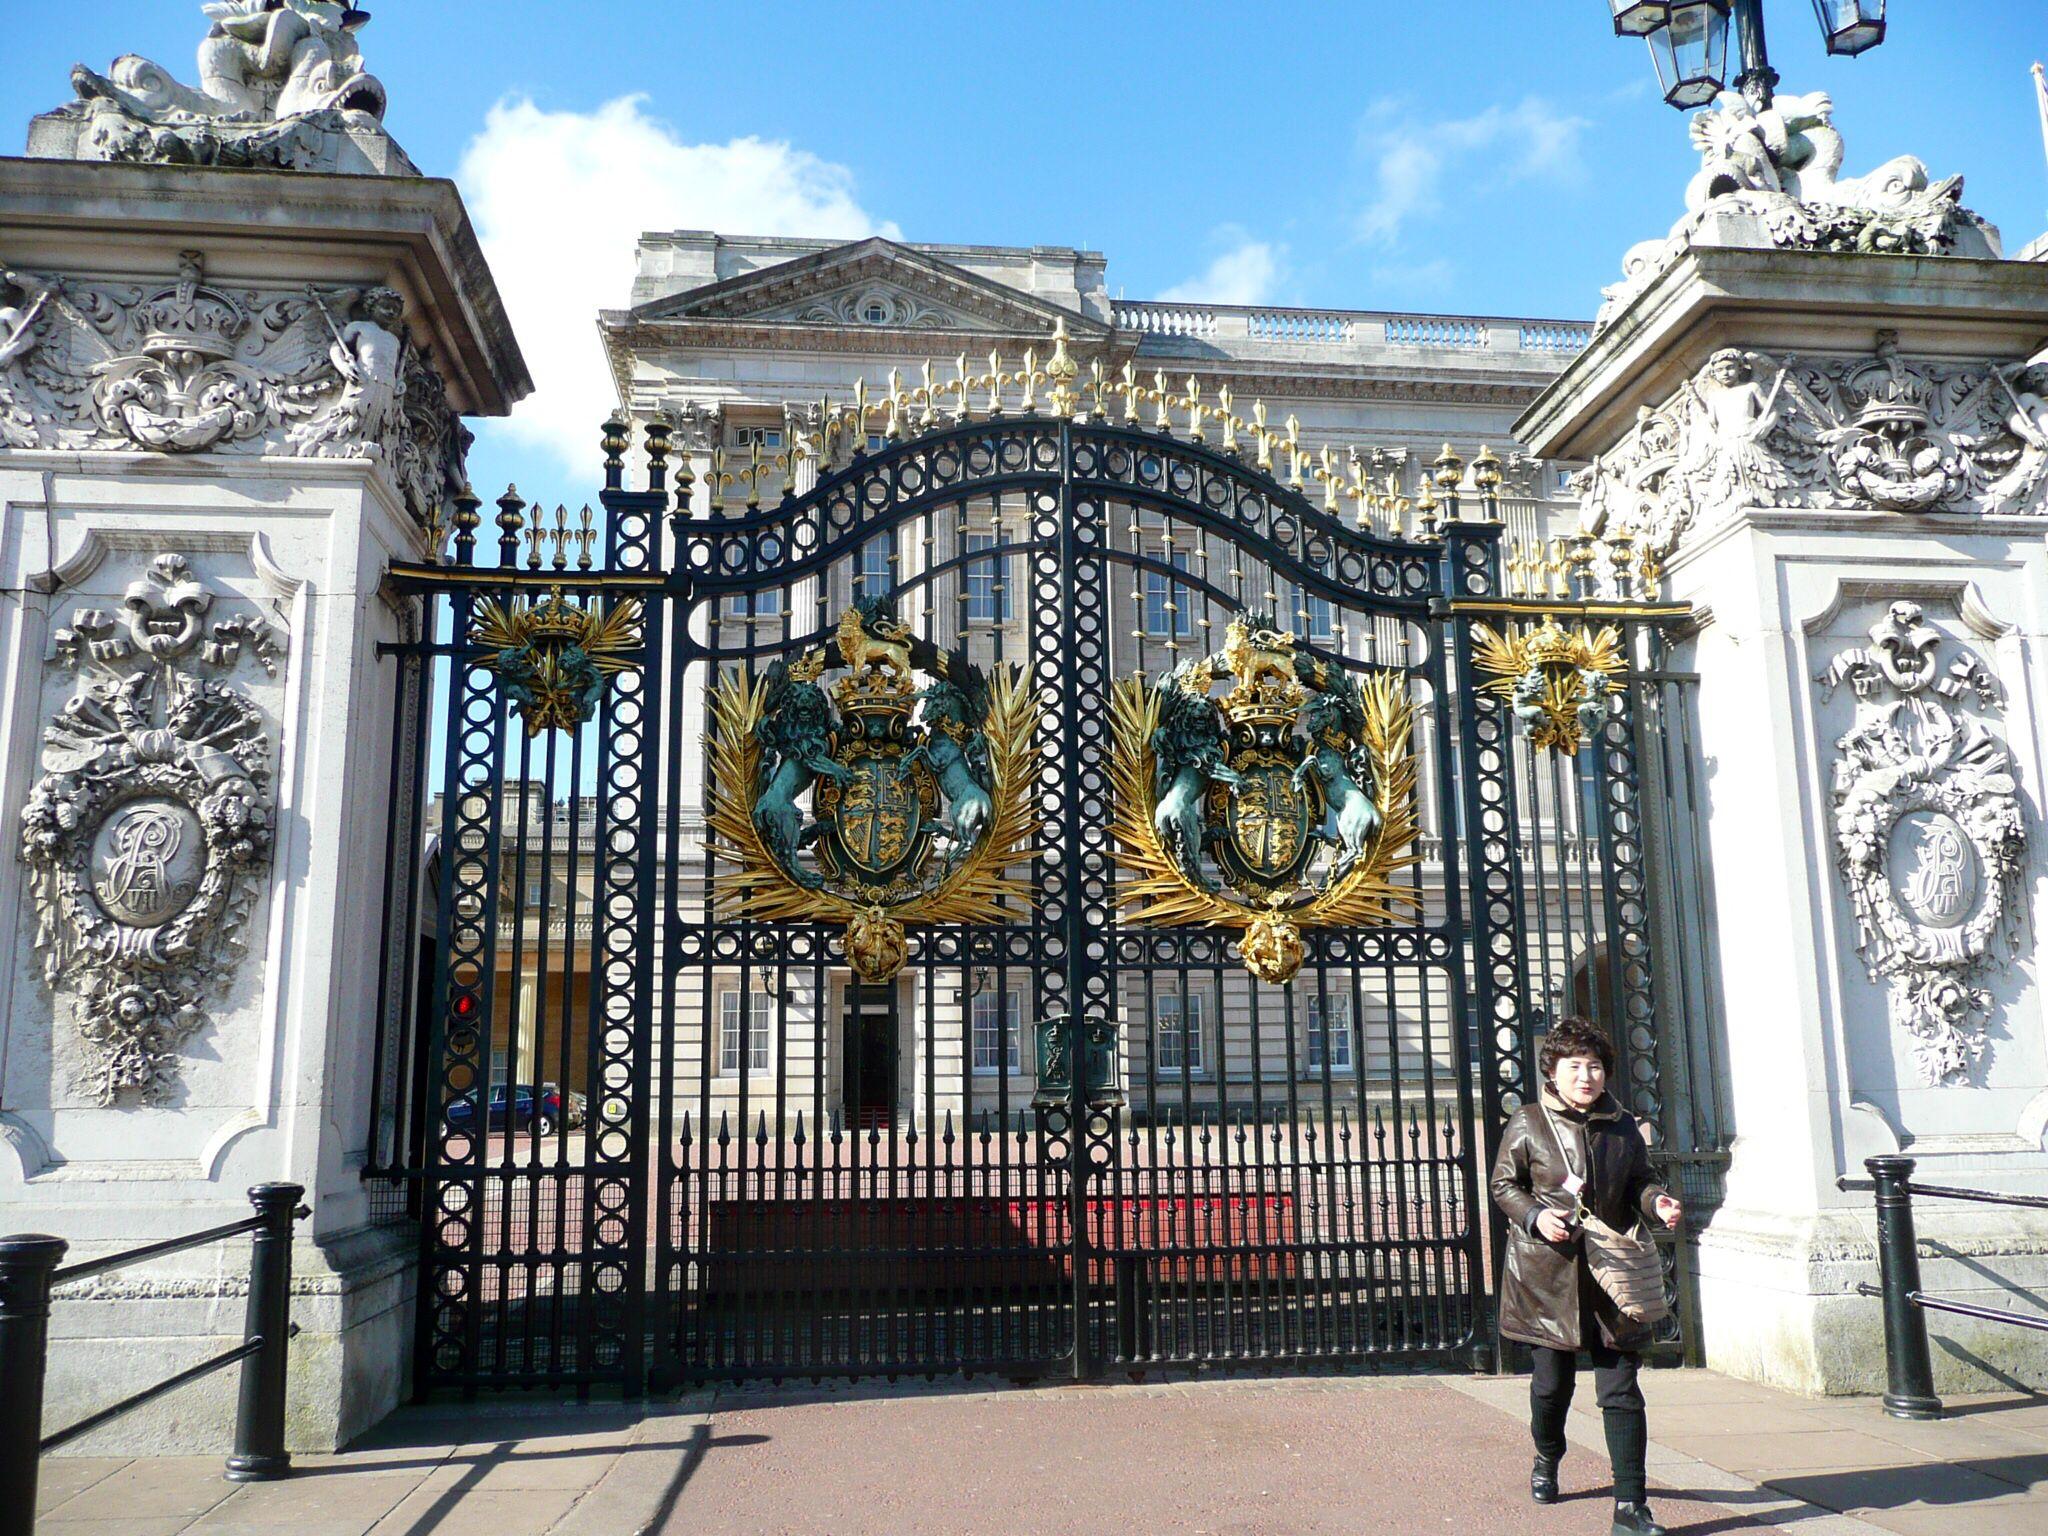 Buckingham Palace Gates With Images Main Gate Design Gate